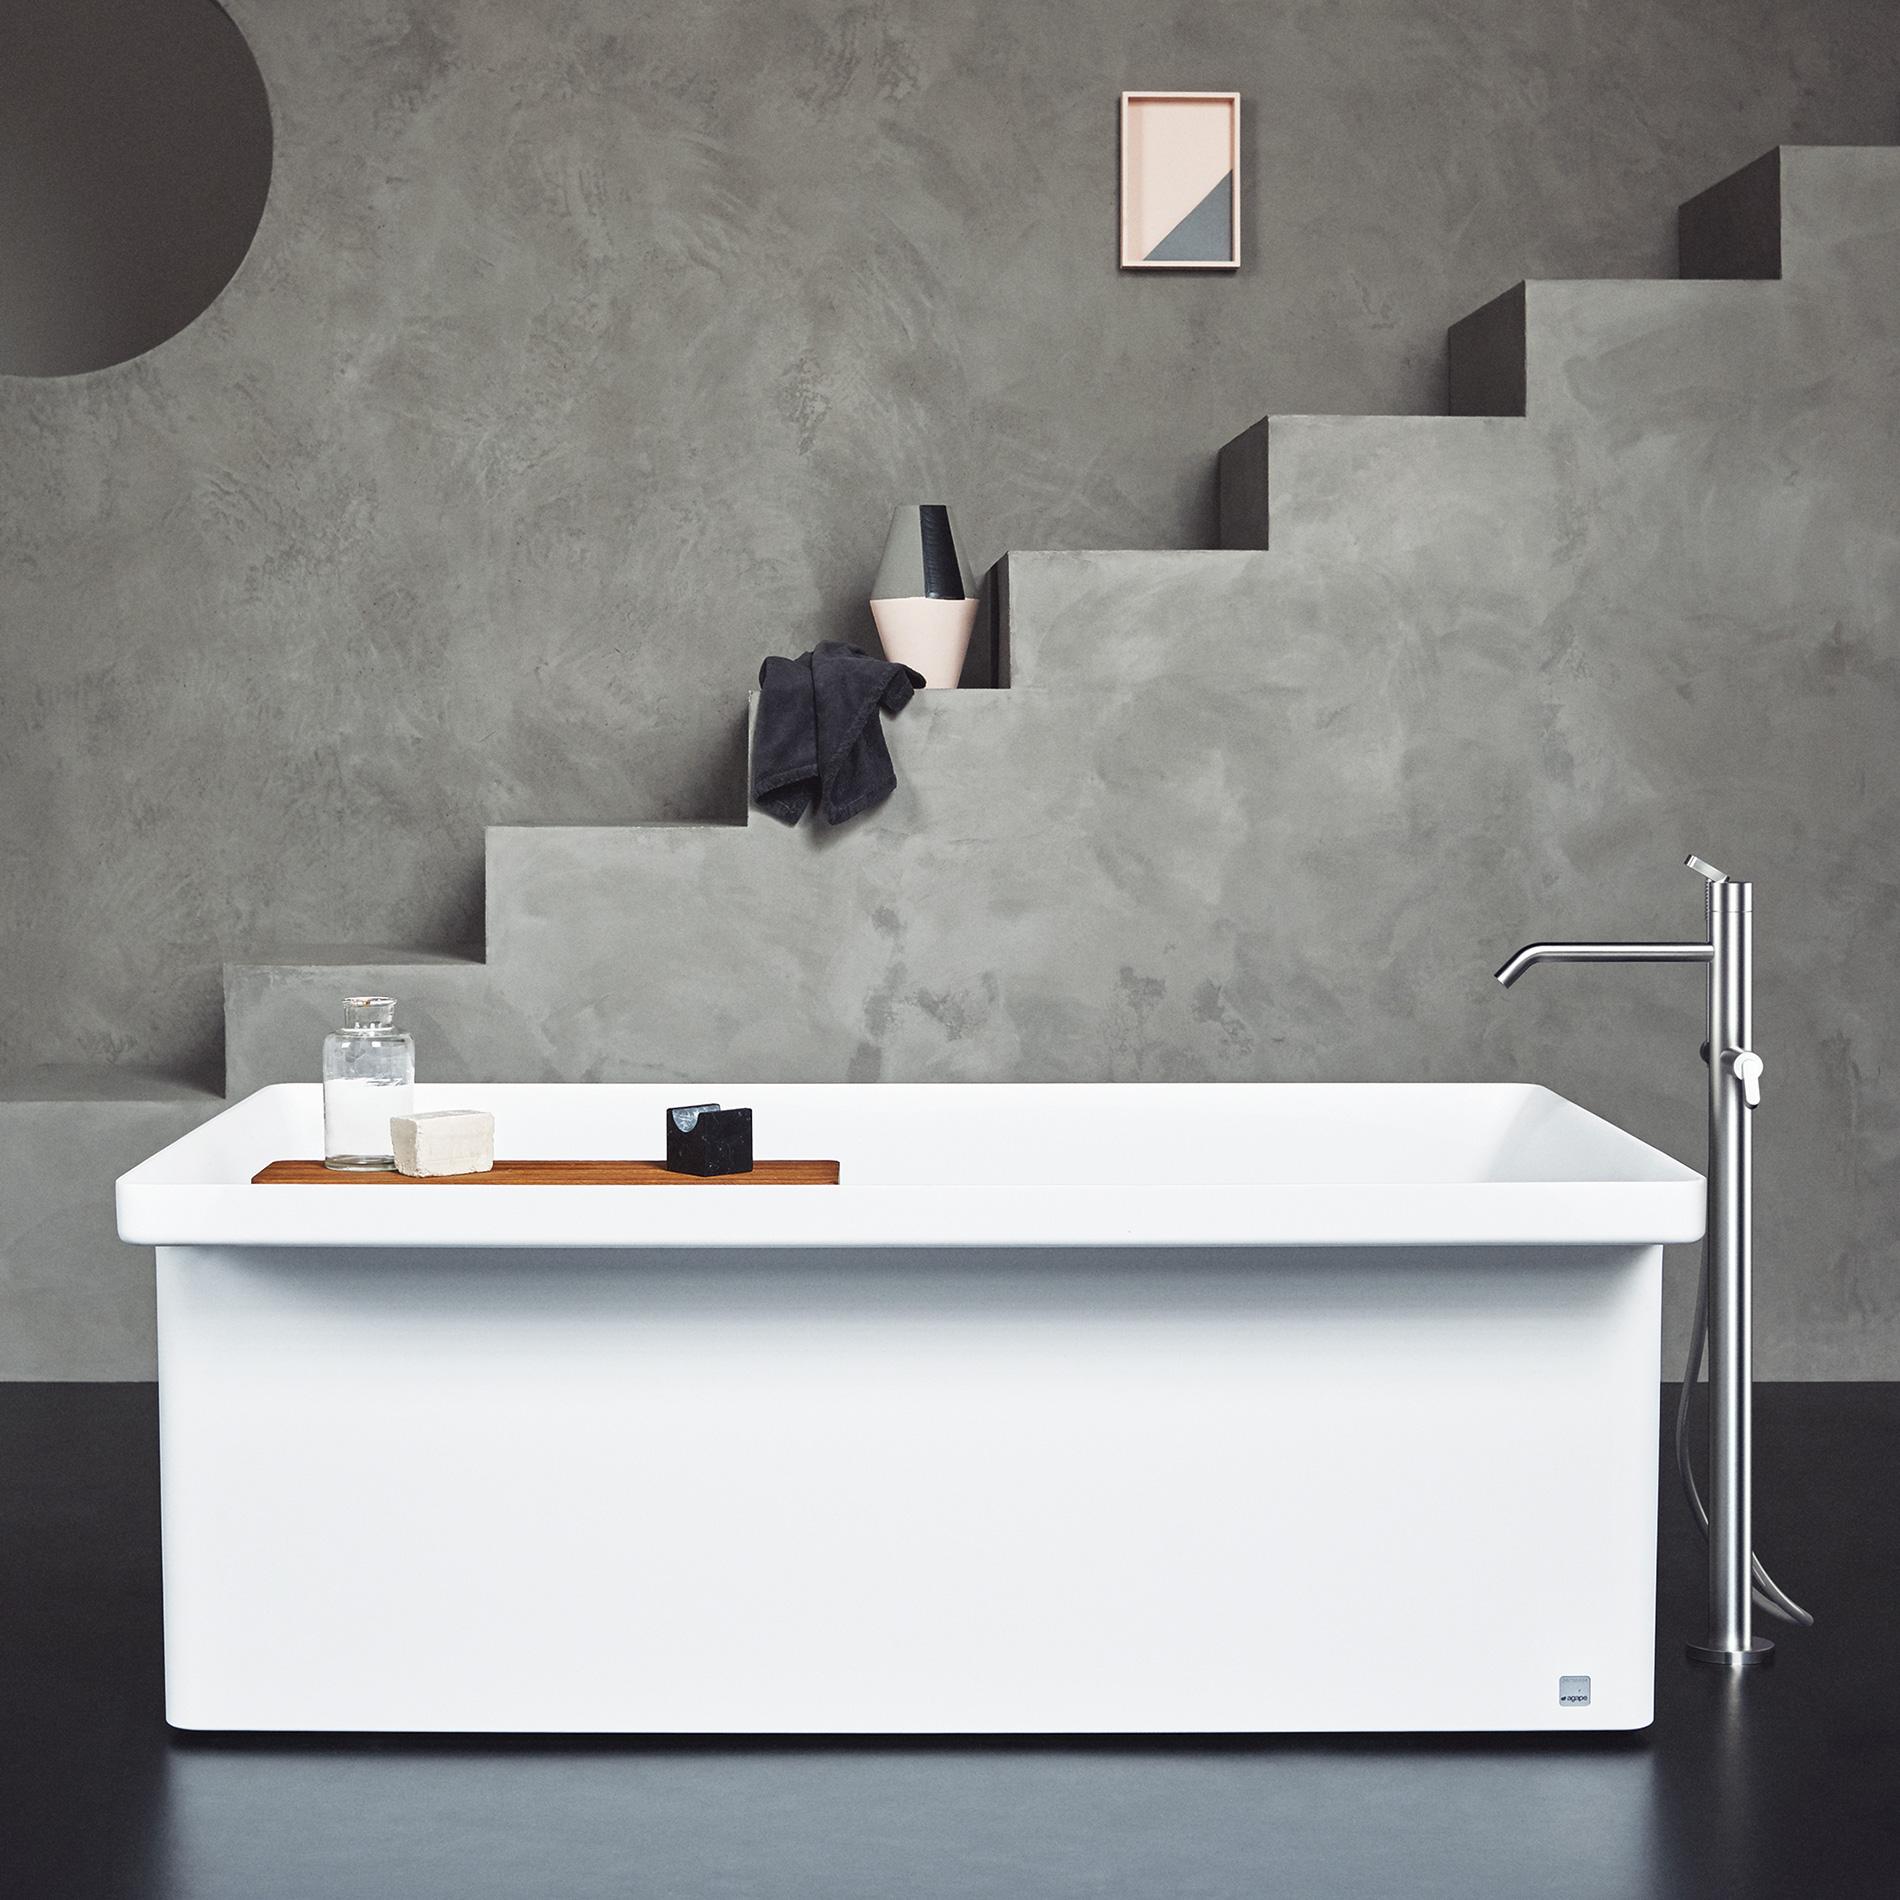 Nicos-International-home-products-Agape-tub-1